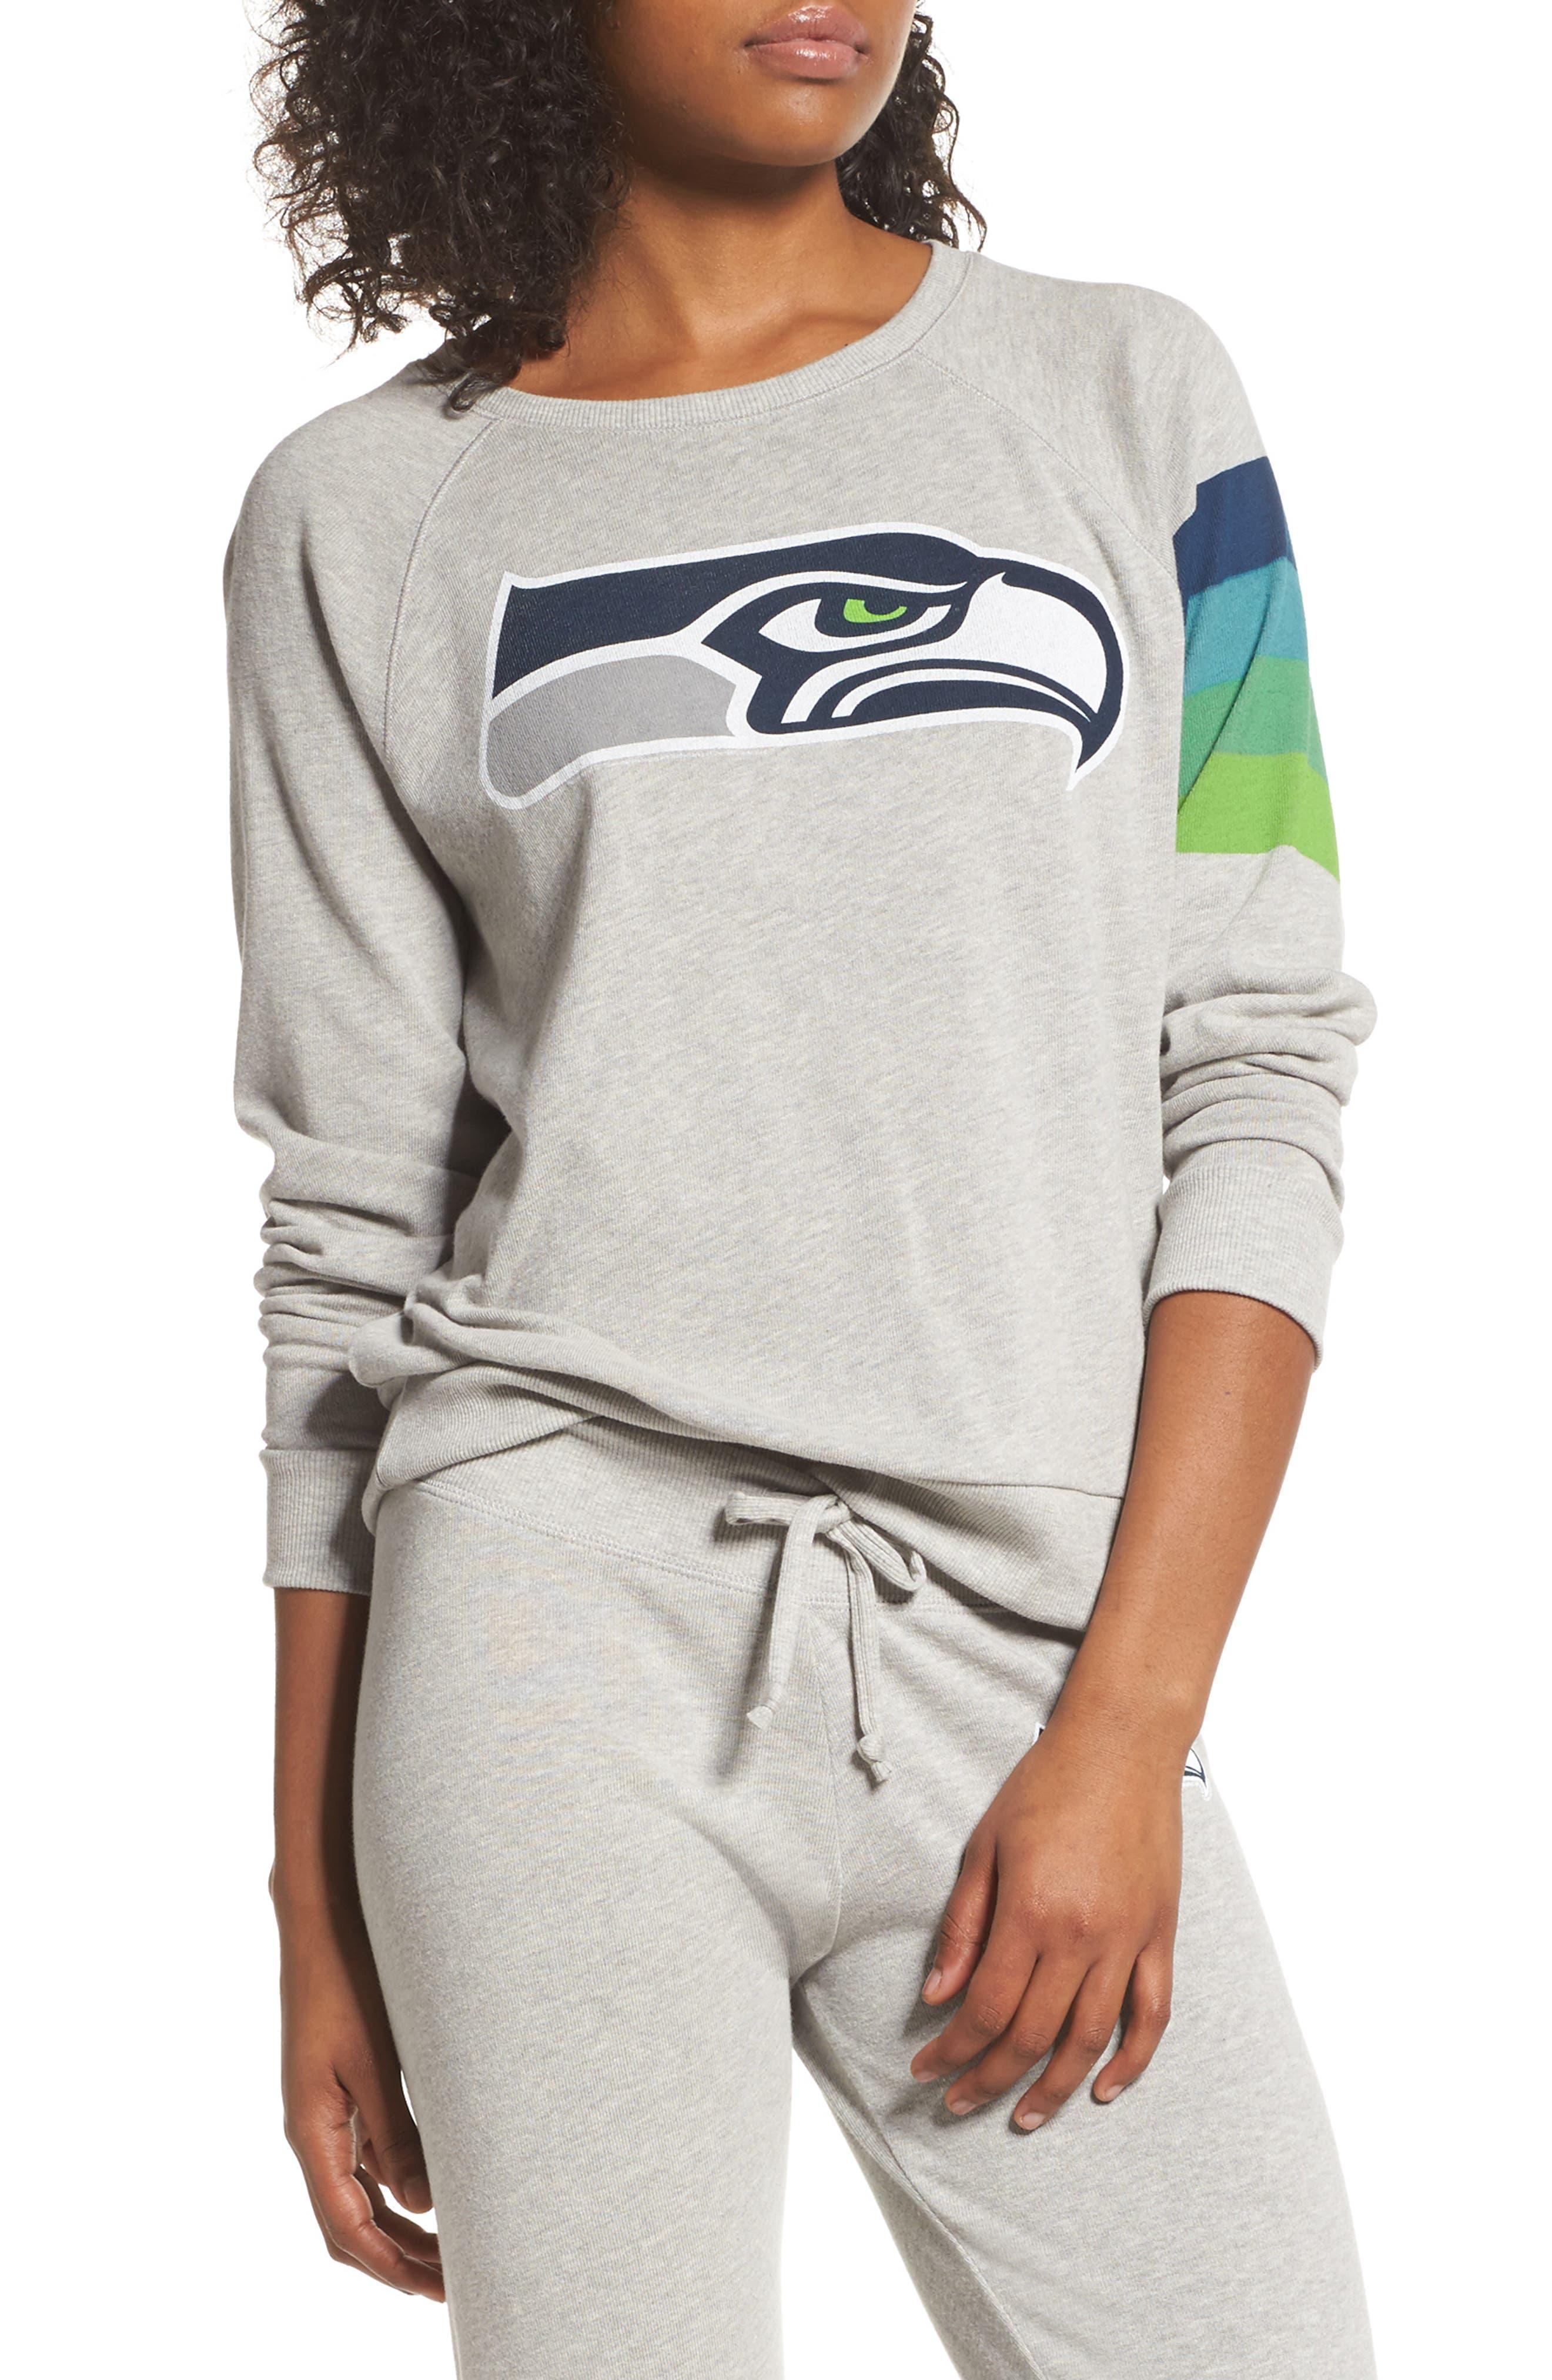 NFL Seattle Seahawks Hacci Sweatshirt,                             Main thumbnail 1, color,                             Dove Heather Grey